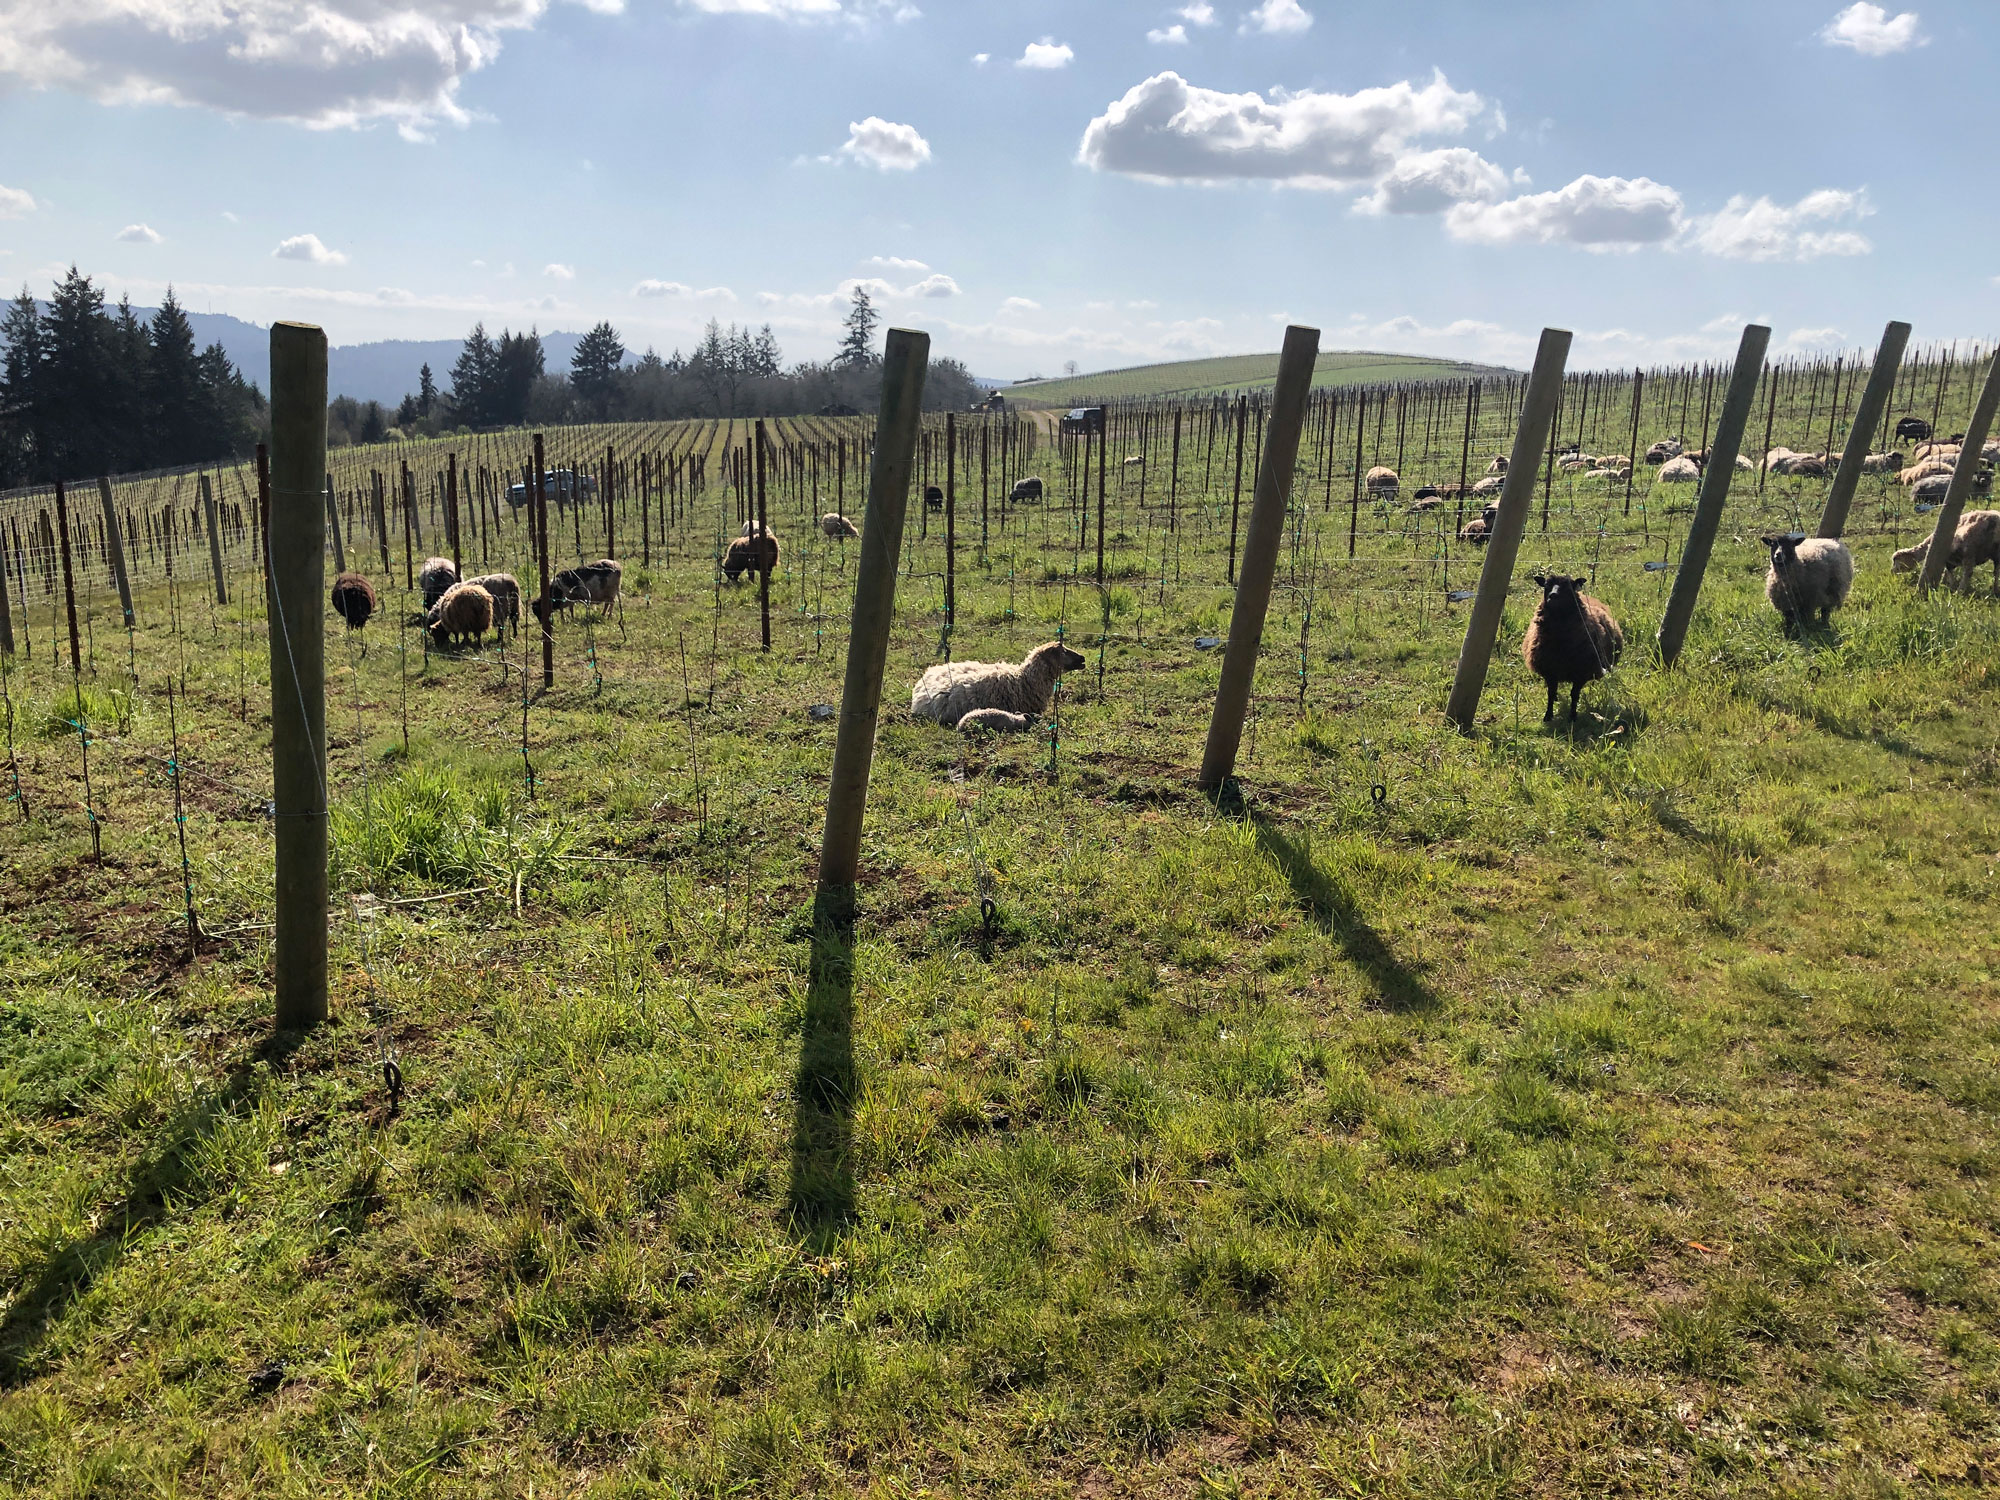 Sheep helping with vineyard care at Cristom Vineyards